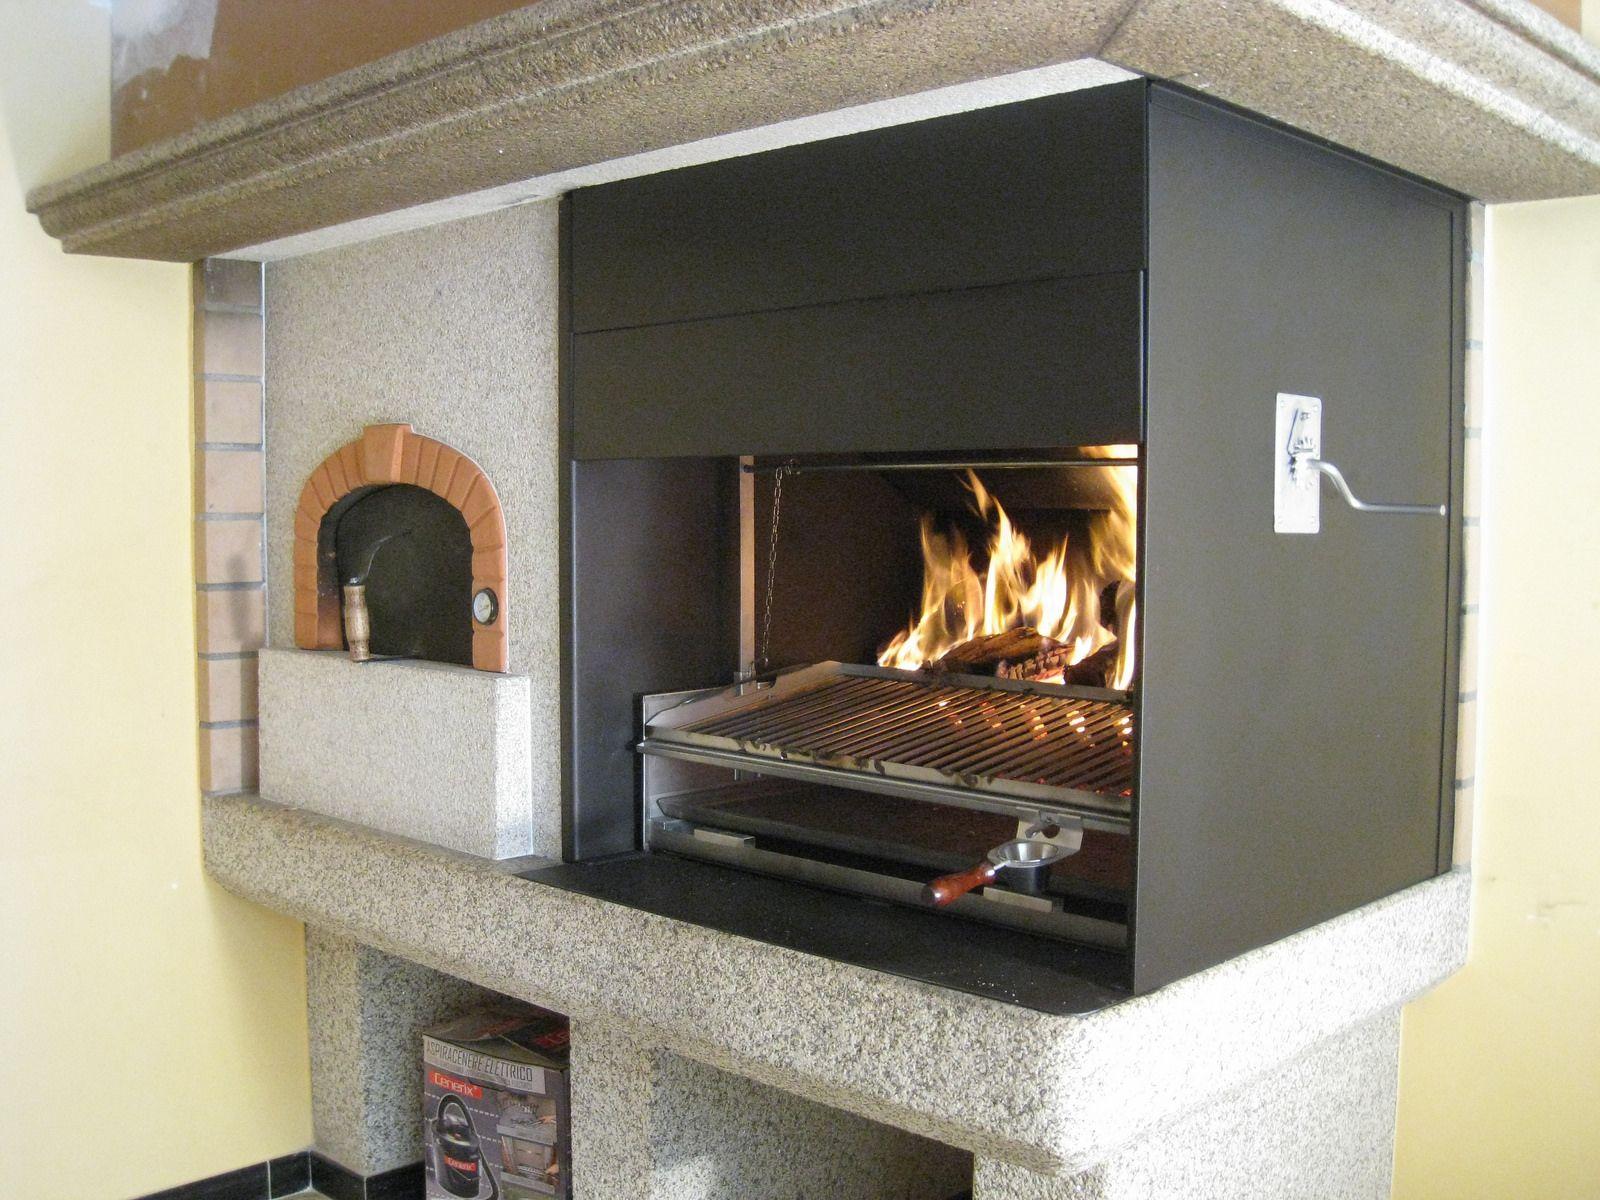 Horno punto alfapizza barbacoa kitchens and fire pit grill - Barbacoa obra ...